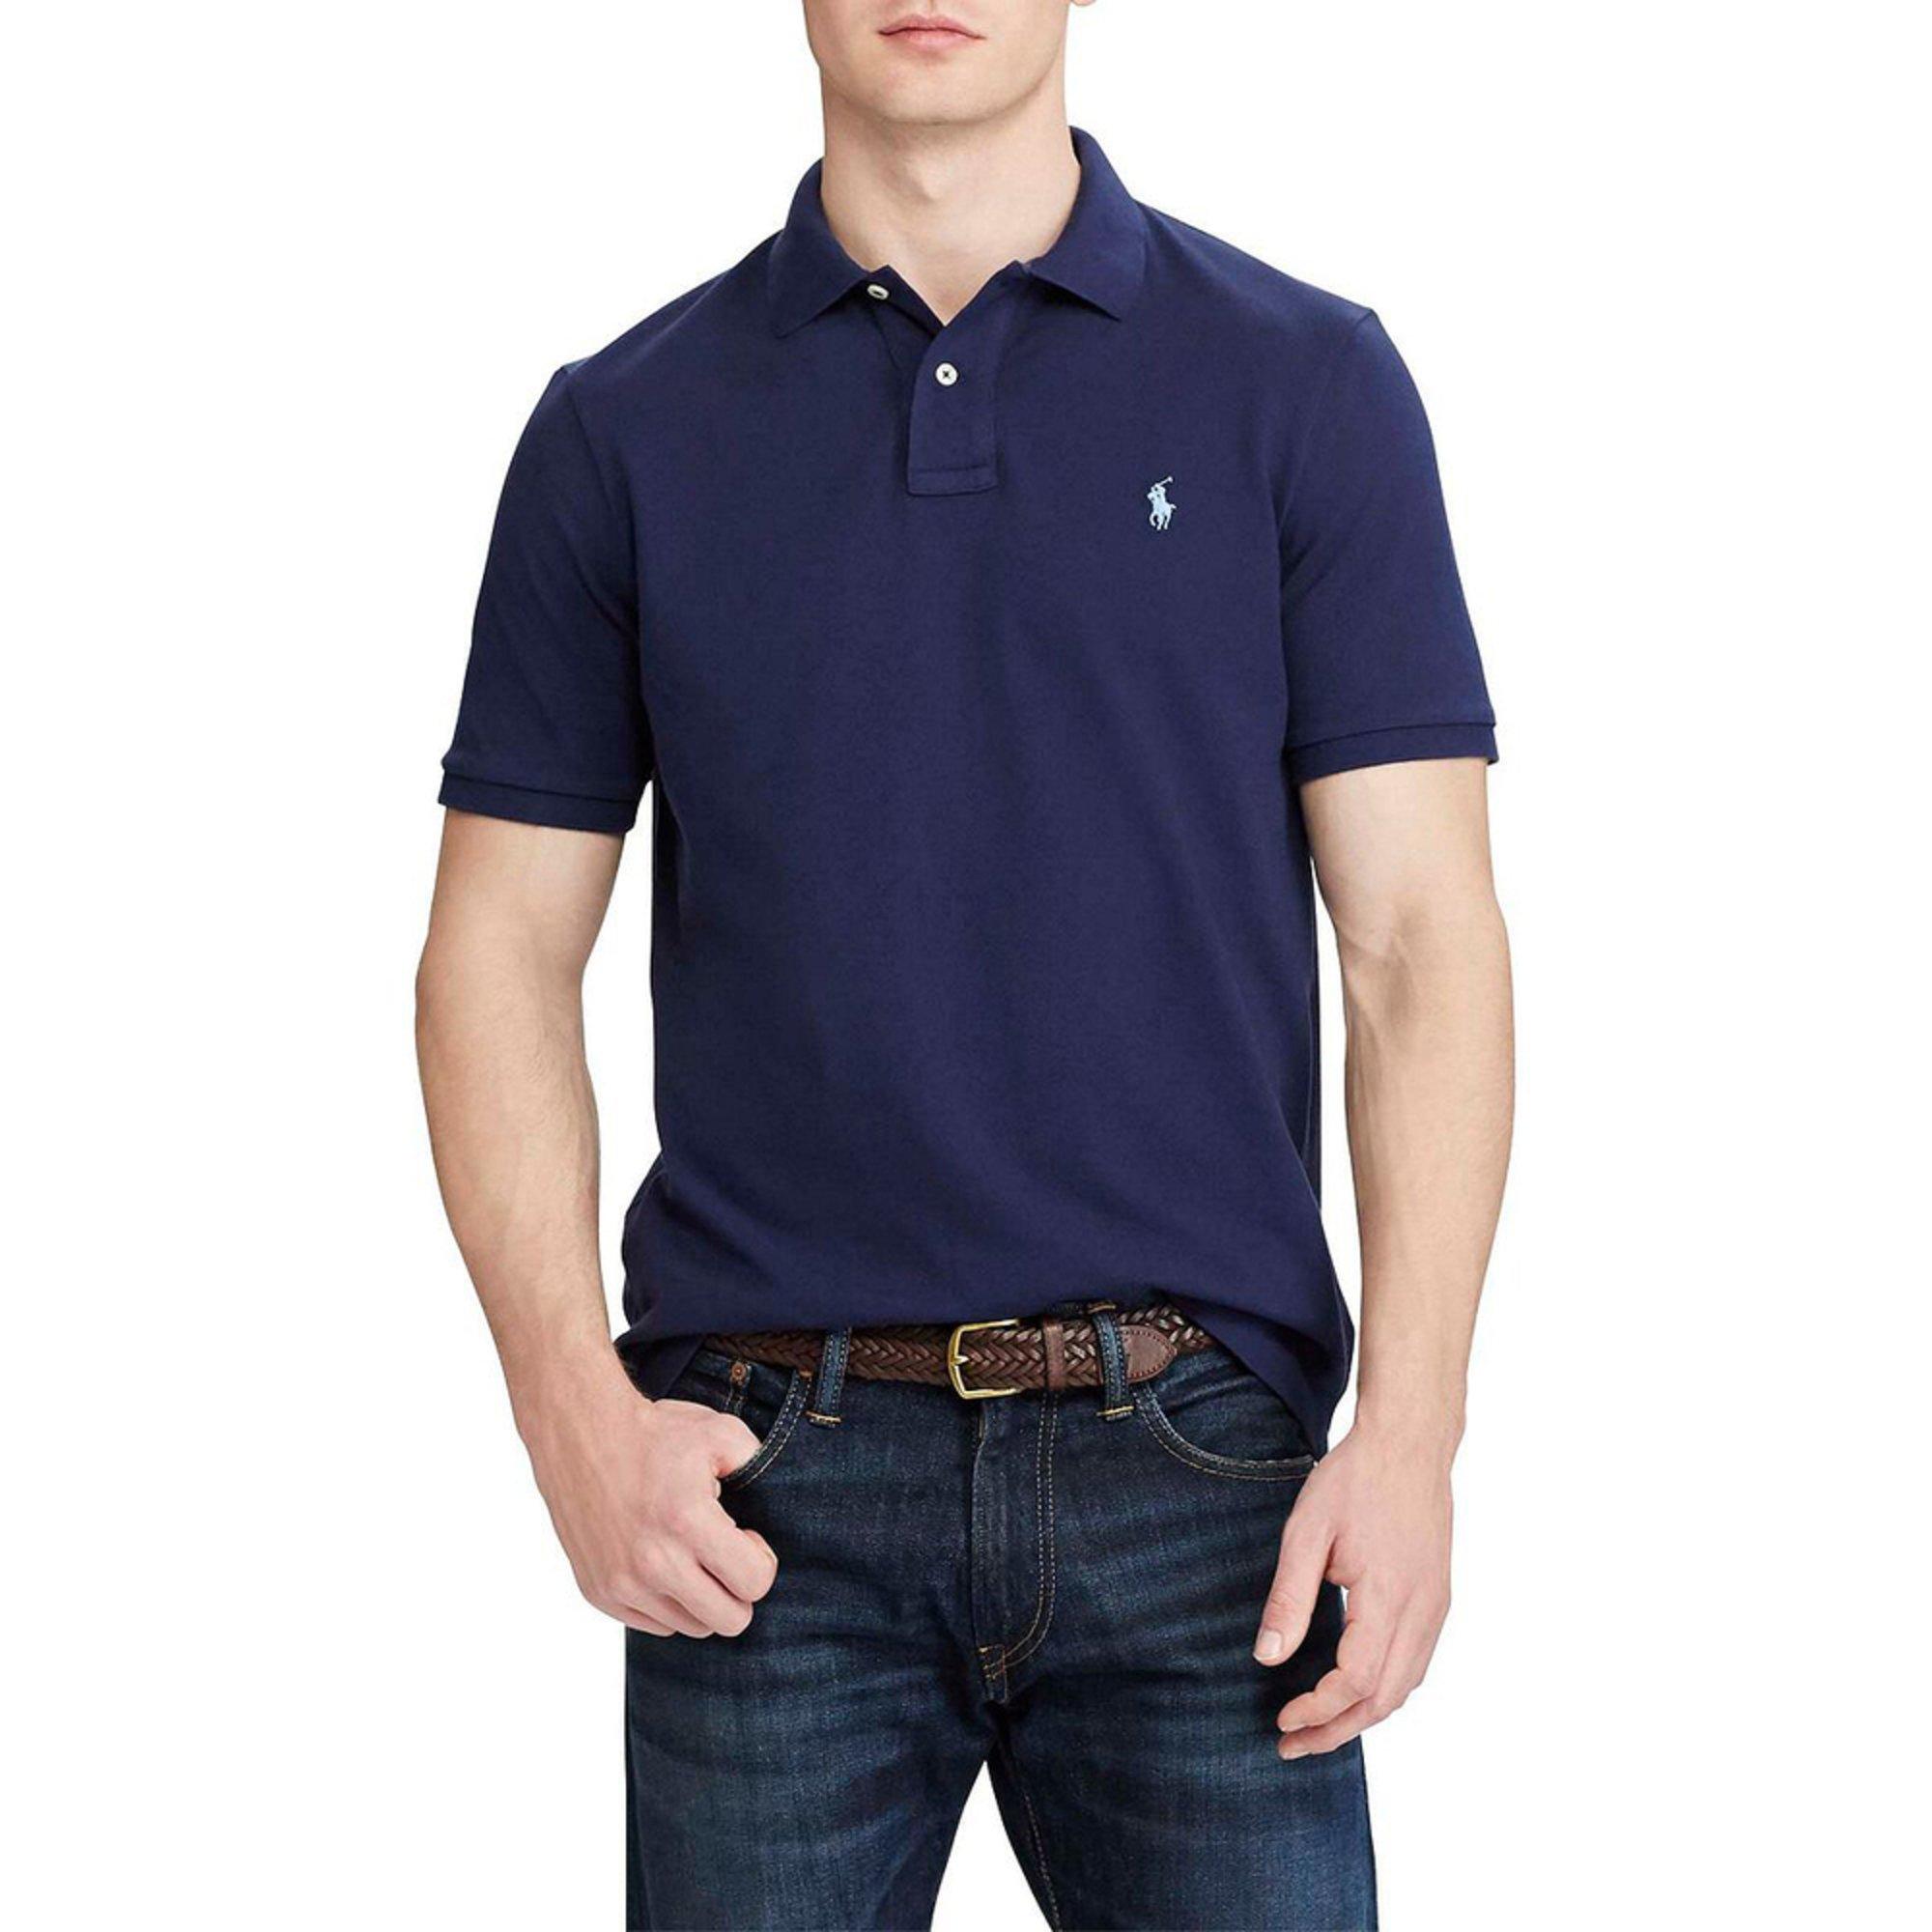 36c32eee6a2 Polo Ralph Lauren Men s Short Sleeve Mesh Classic Fit Polo